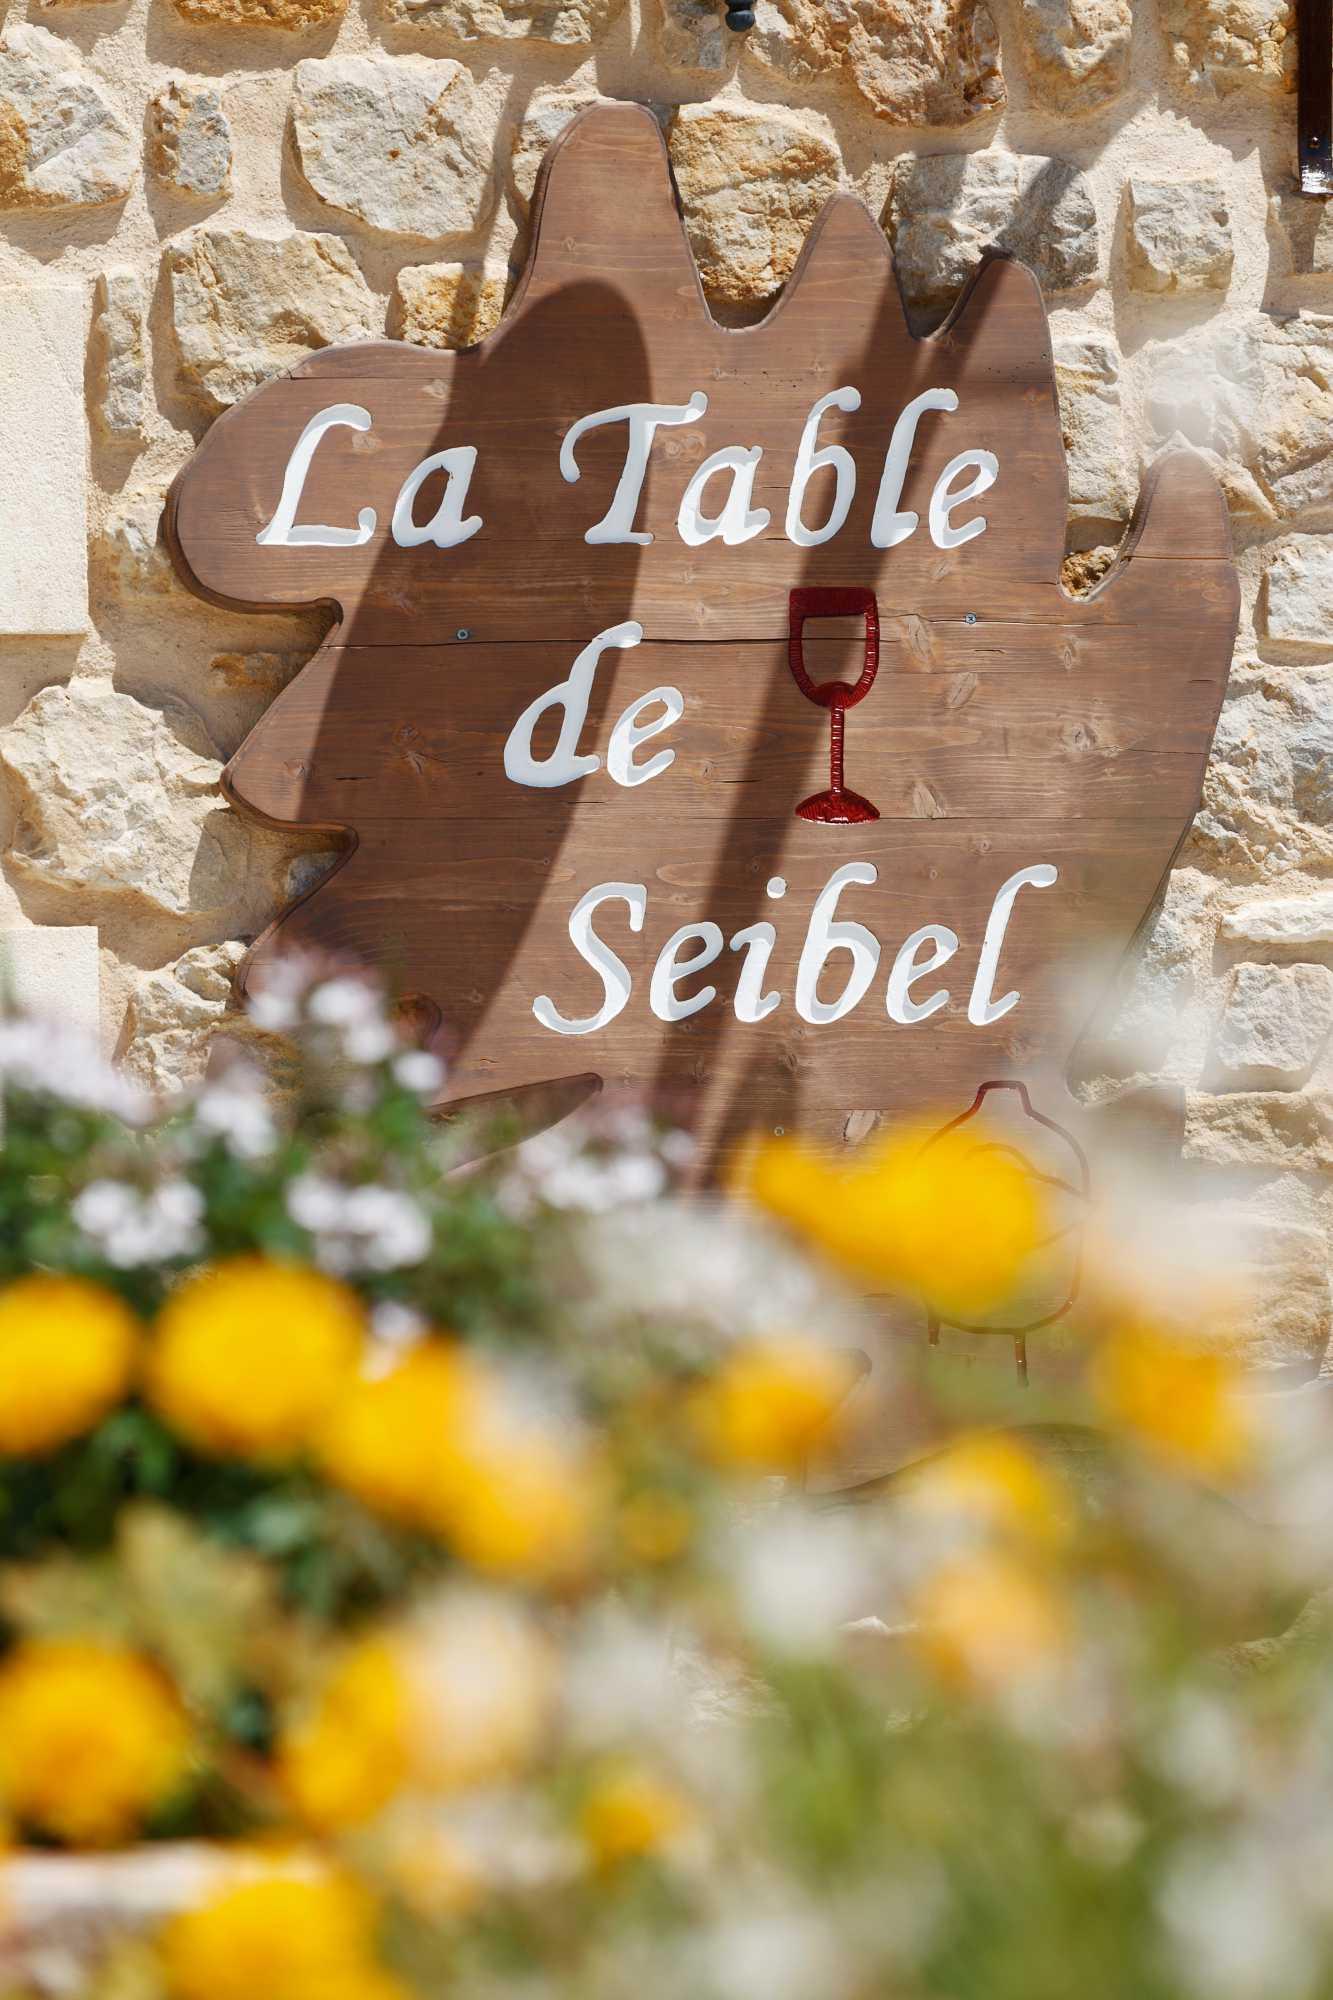 domaine sevenier camping 5 etoiles ardeche restaurant logo 2 - domaine-sevenier-camping-5-etoiles-ardeche-restaurant-logo-2